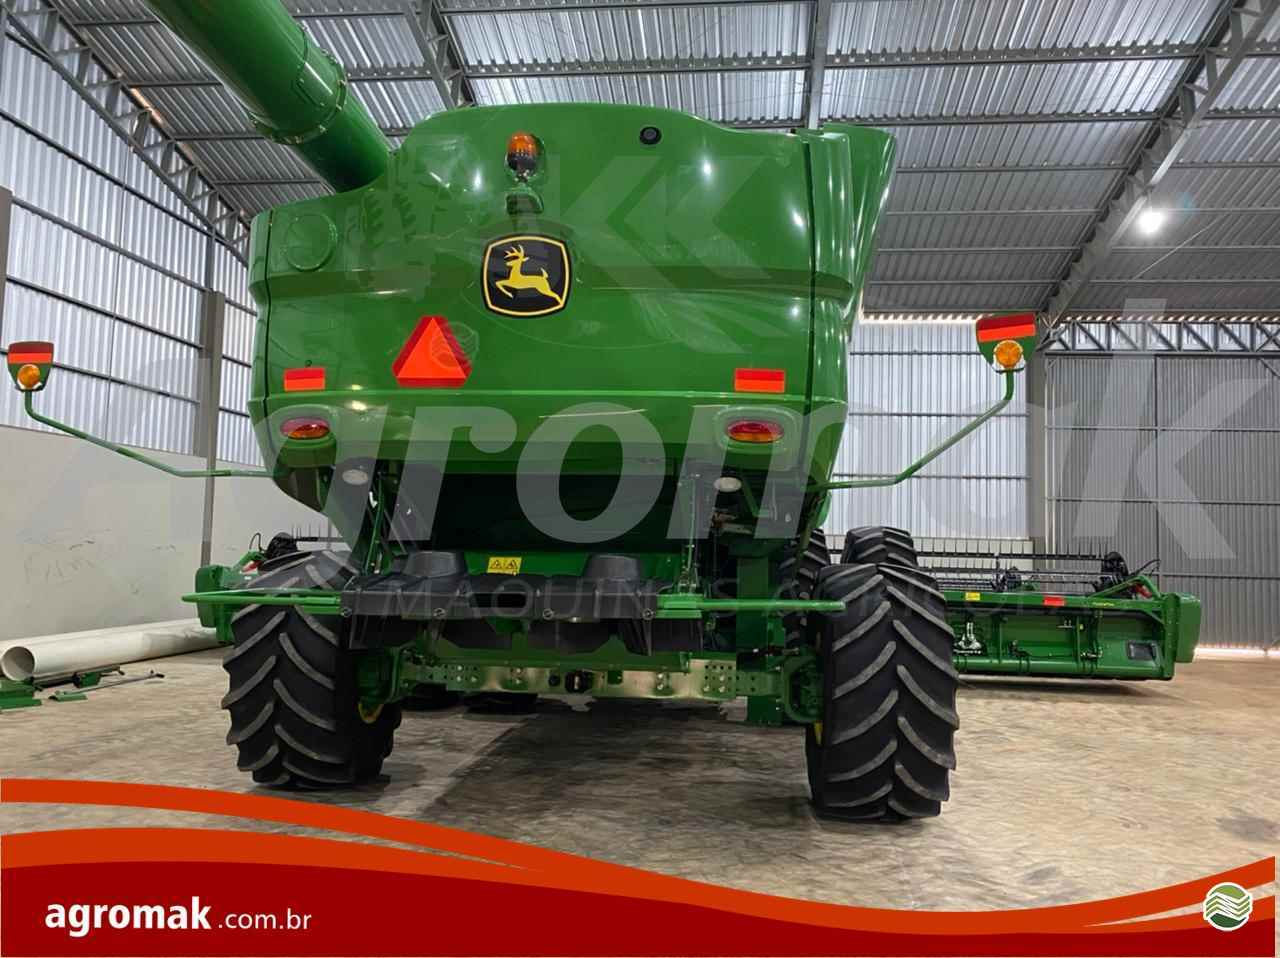 JOHN DEERE JOHN DEERE S680  2016/2016 Agromak Máquinas Agrícolas